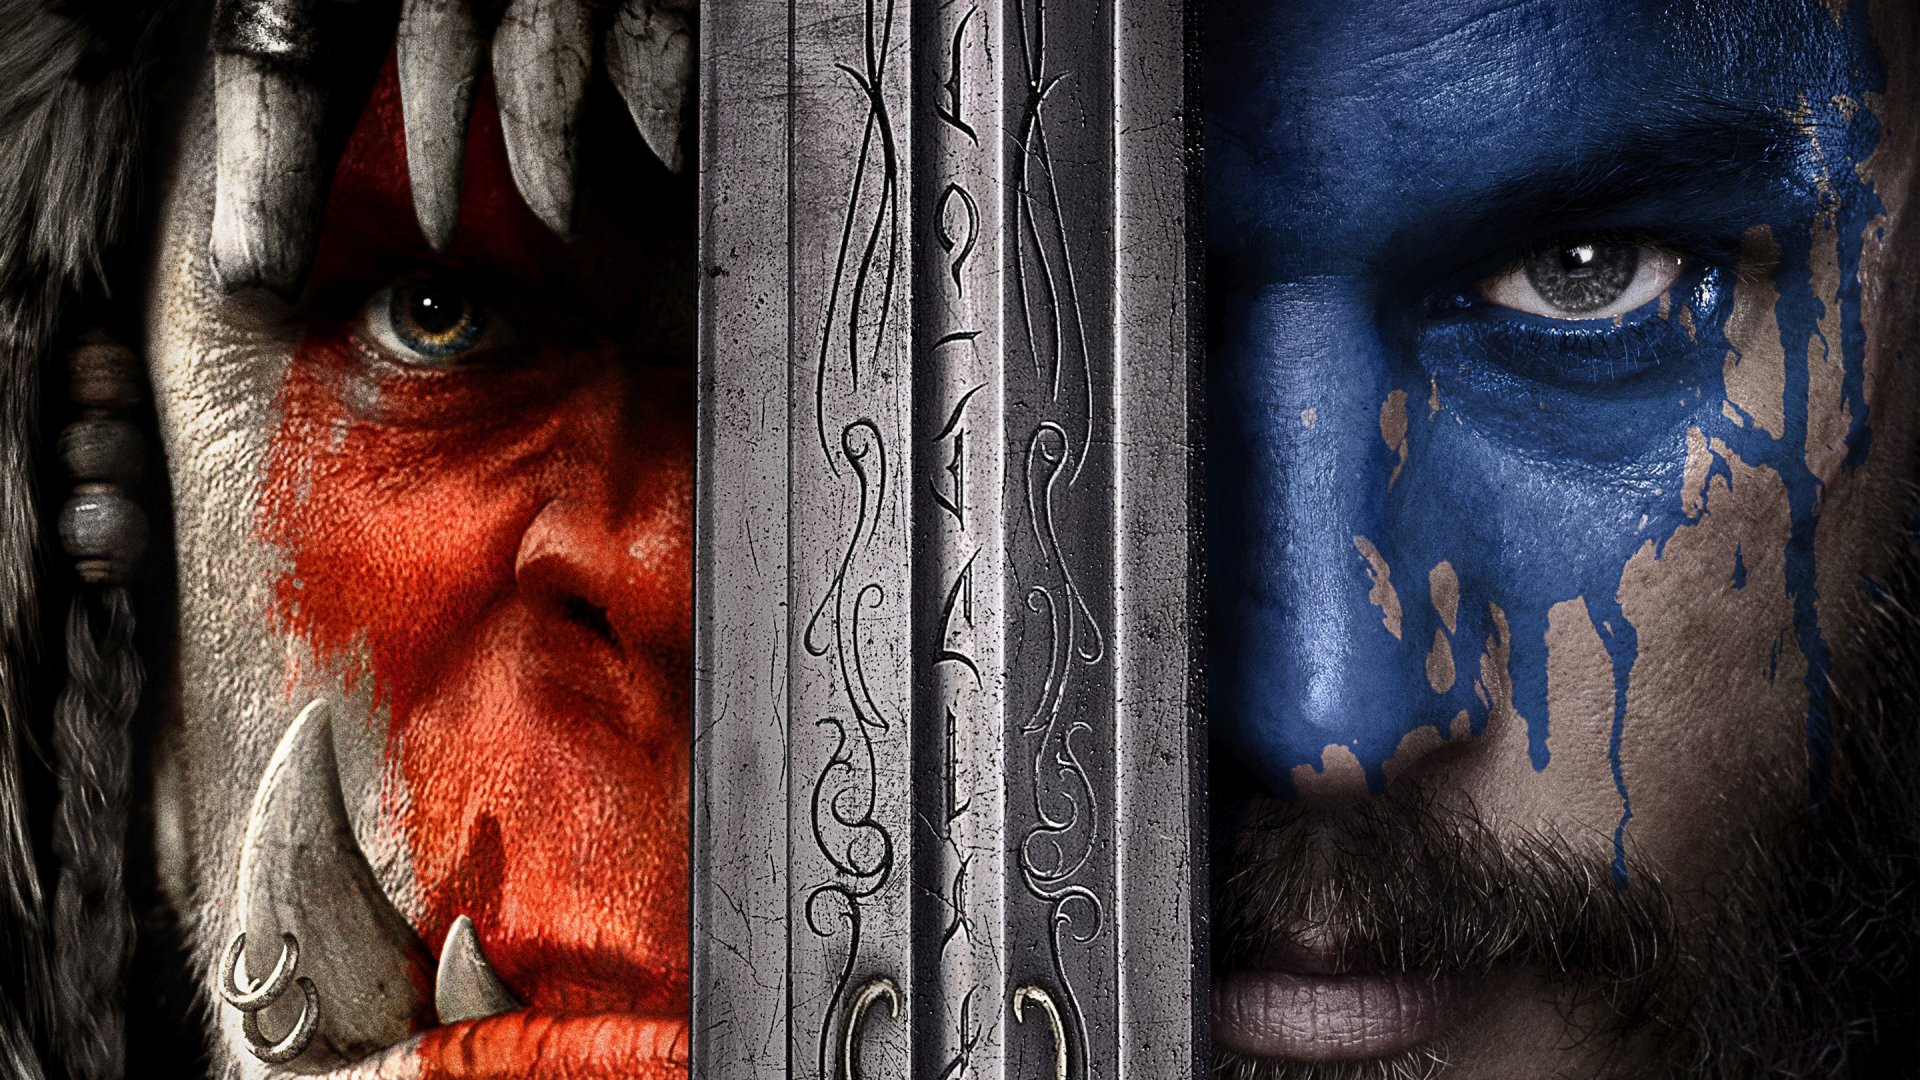 Película Warcraft Fondo De Pantalla Id2391